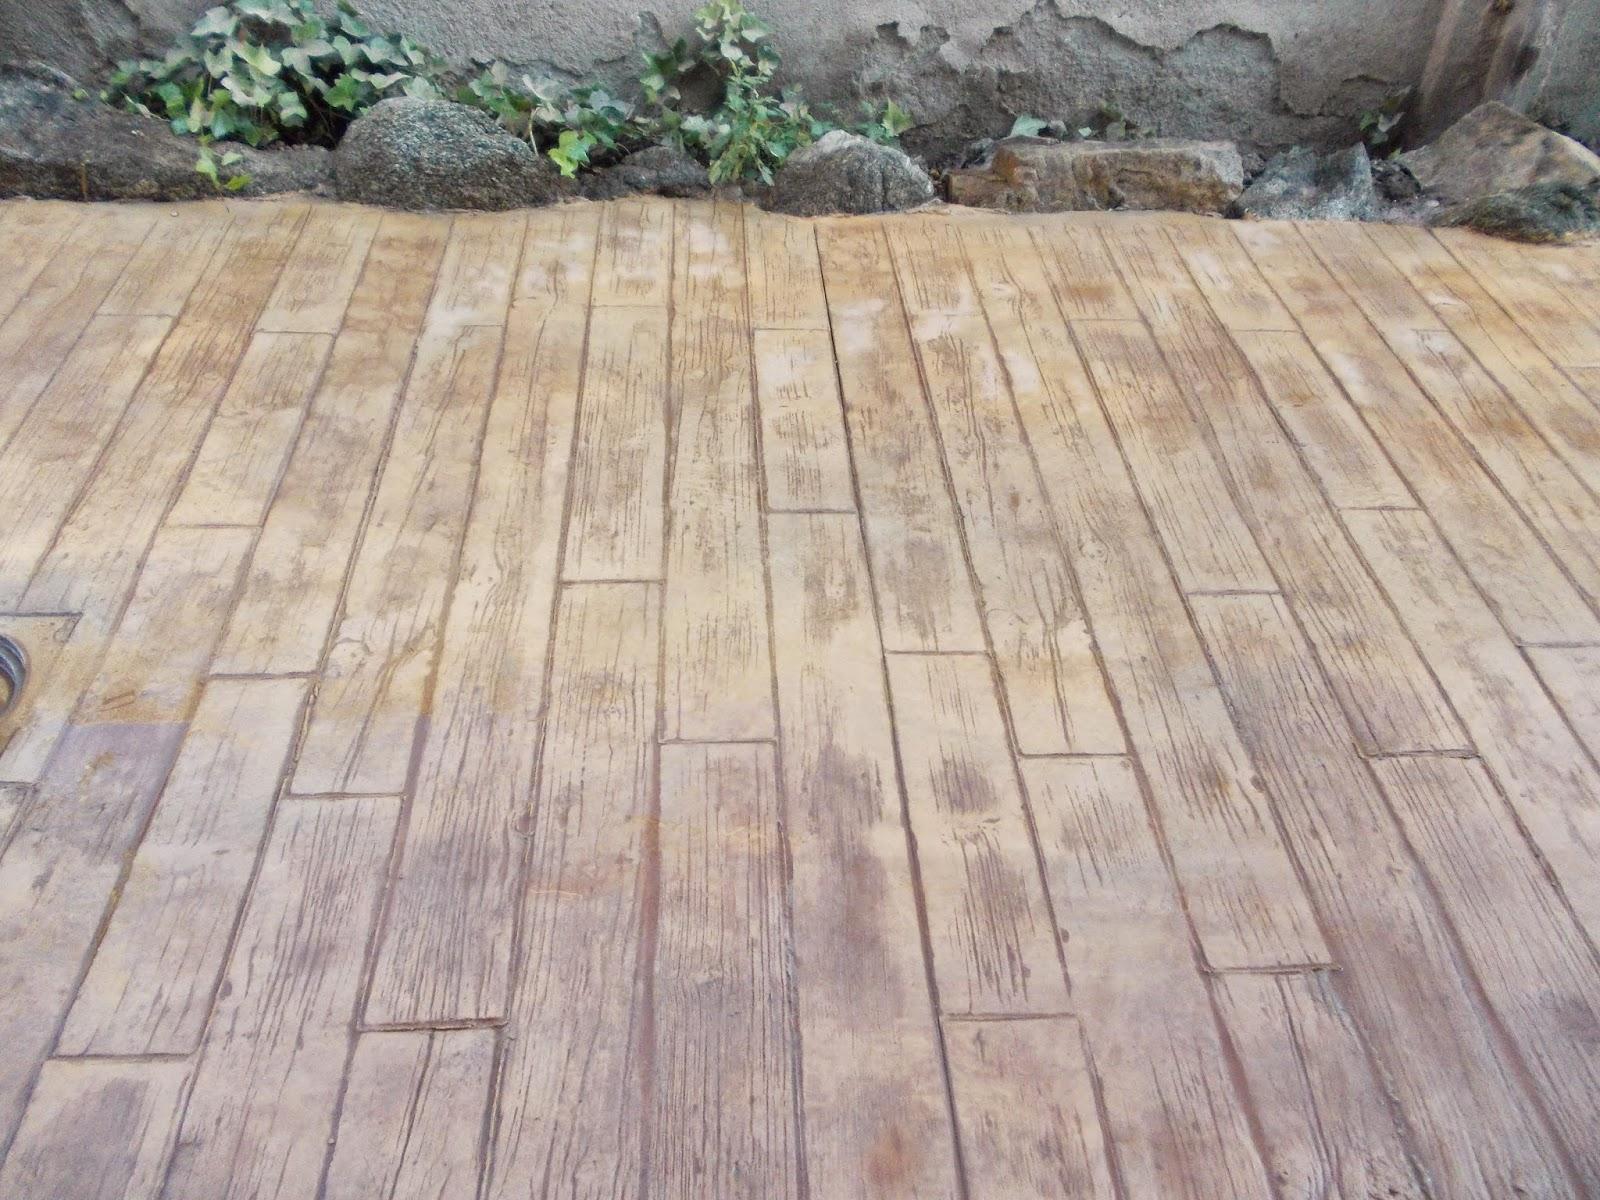 Pavimento continuo de hormig n impreso en guadamur for Resina para hormigon